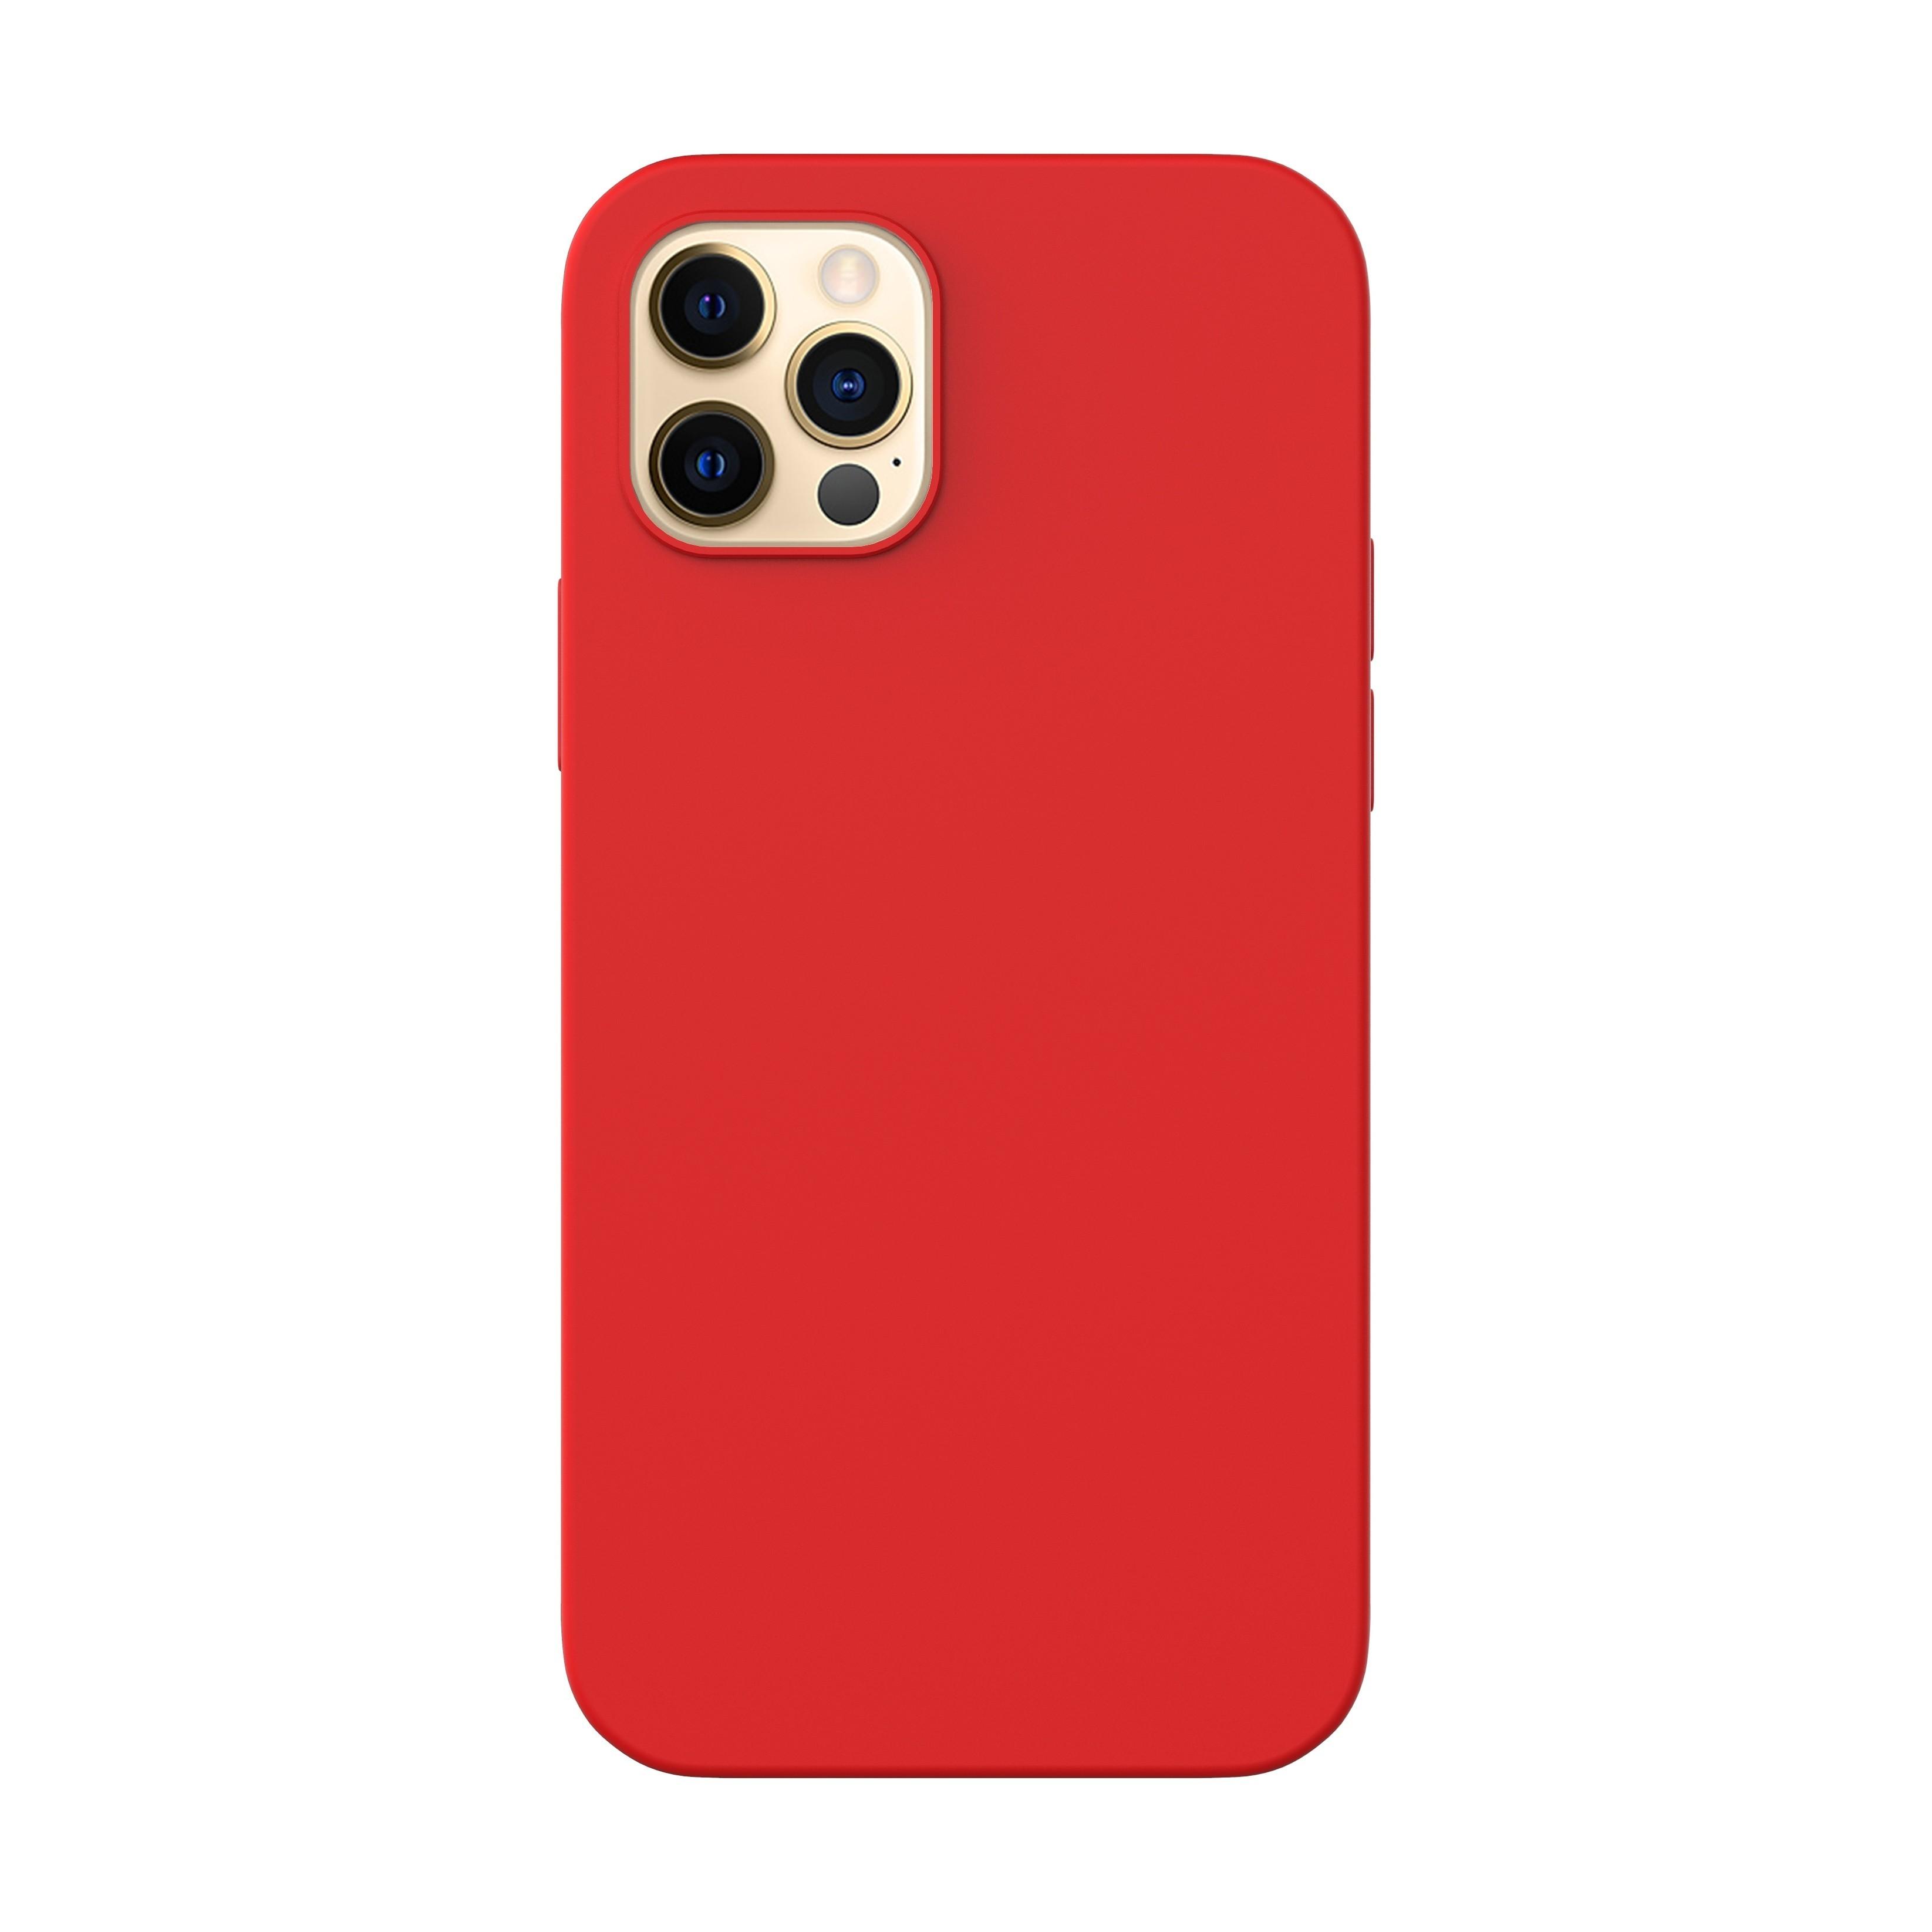 Capac protectie spate cellara din silicon colectia slim pentru iphone 12/12 pro - rosu